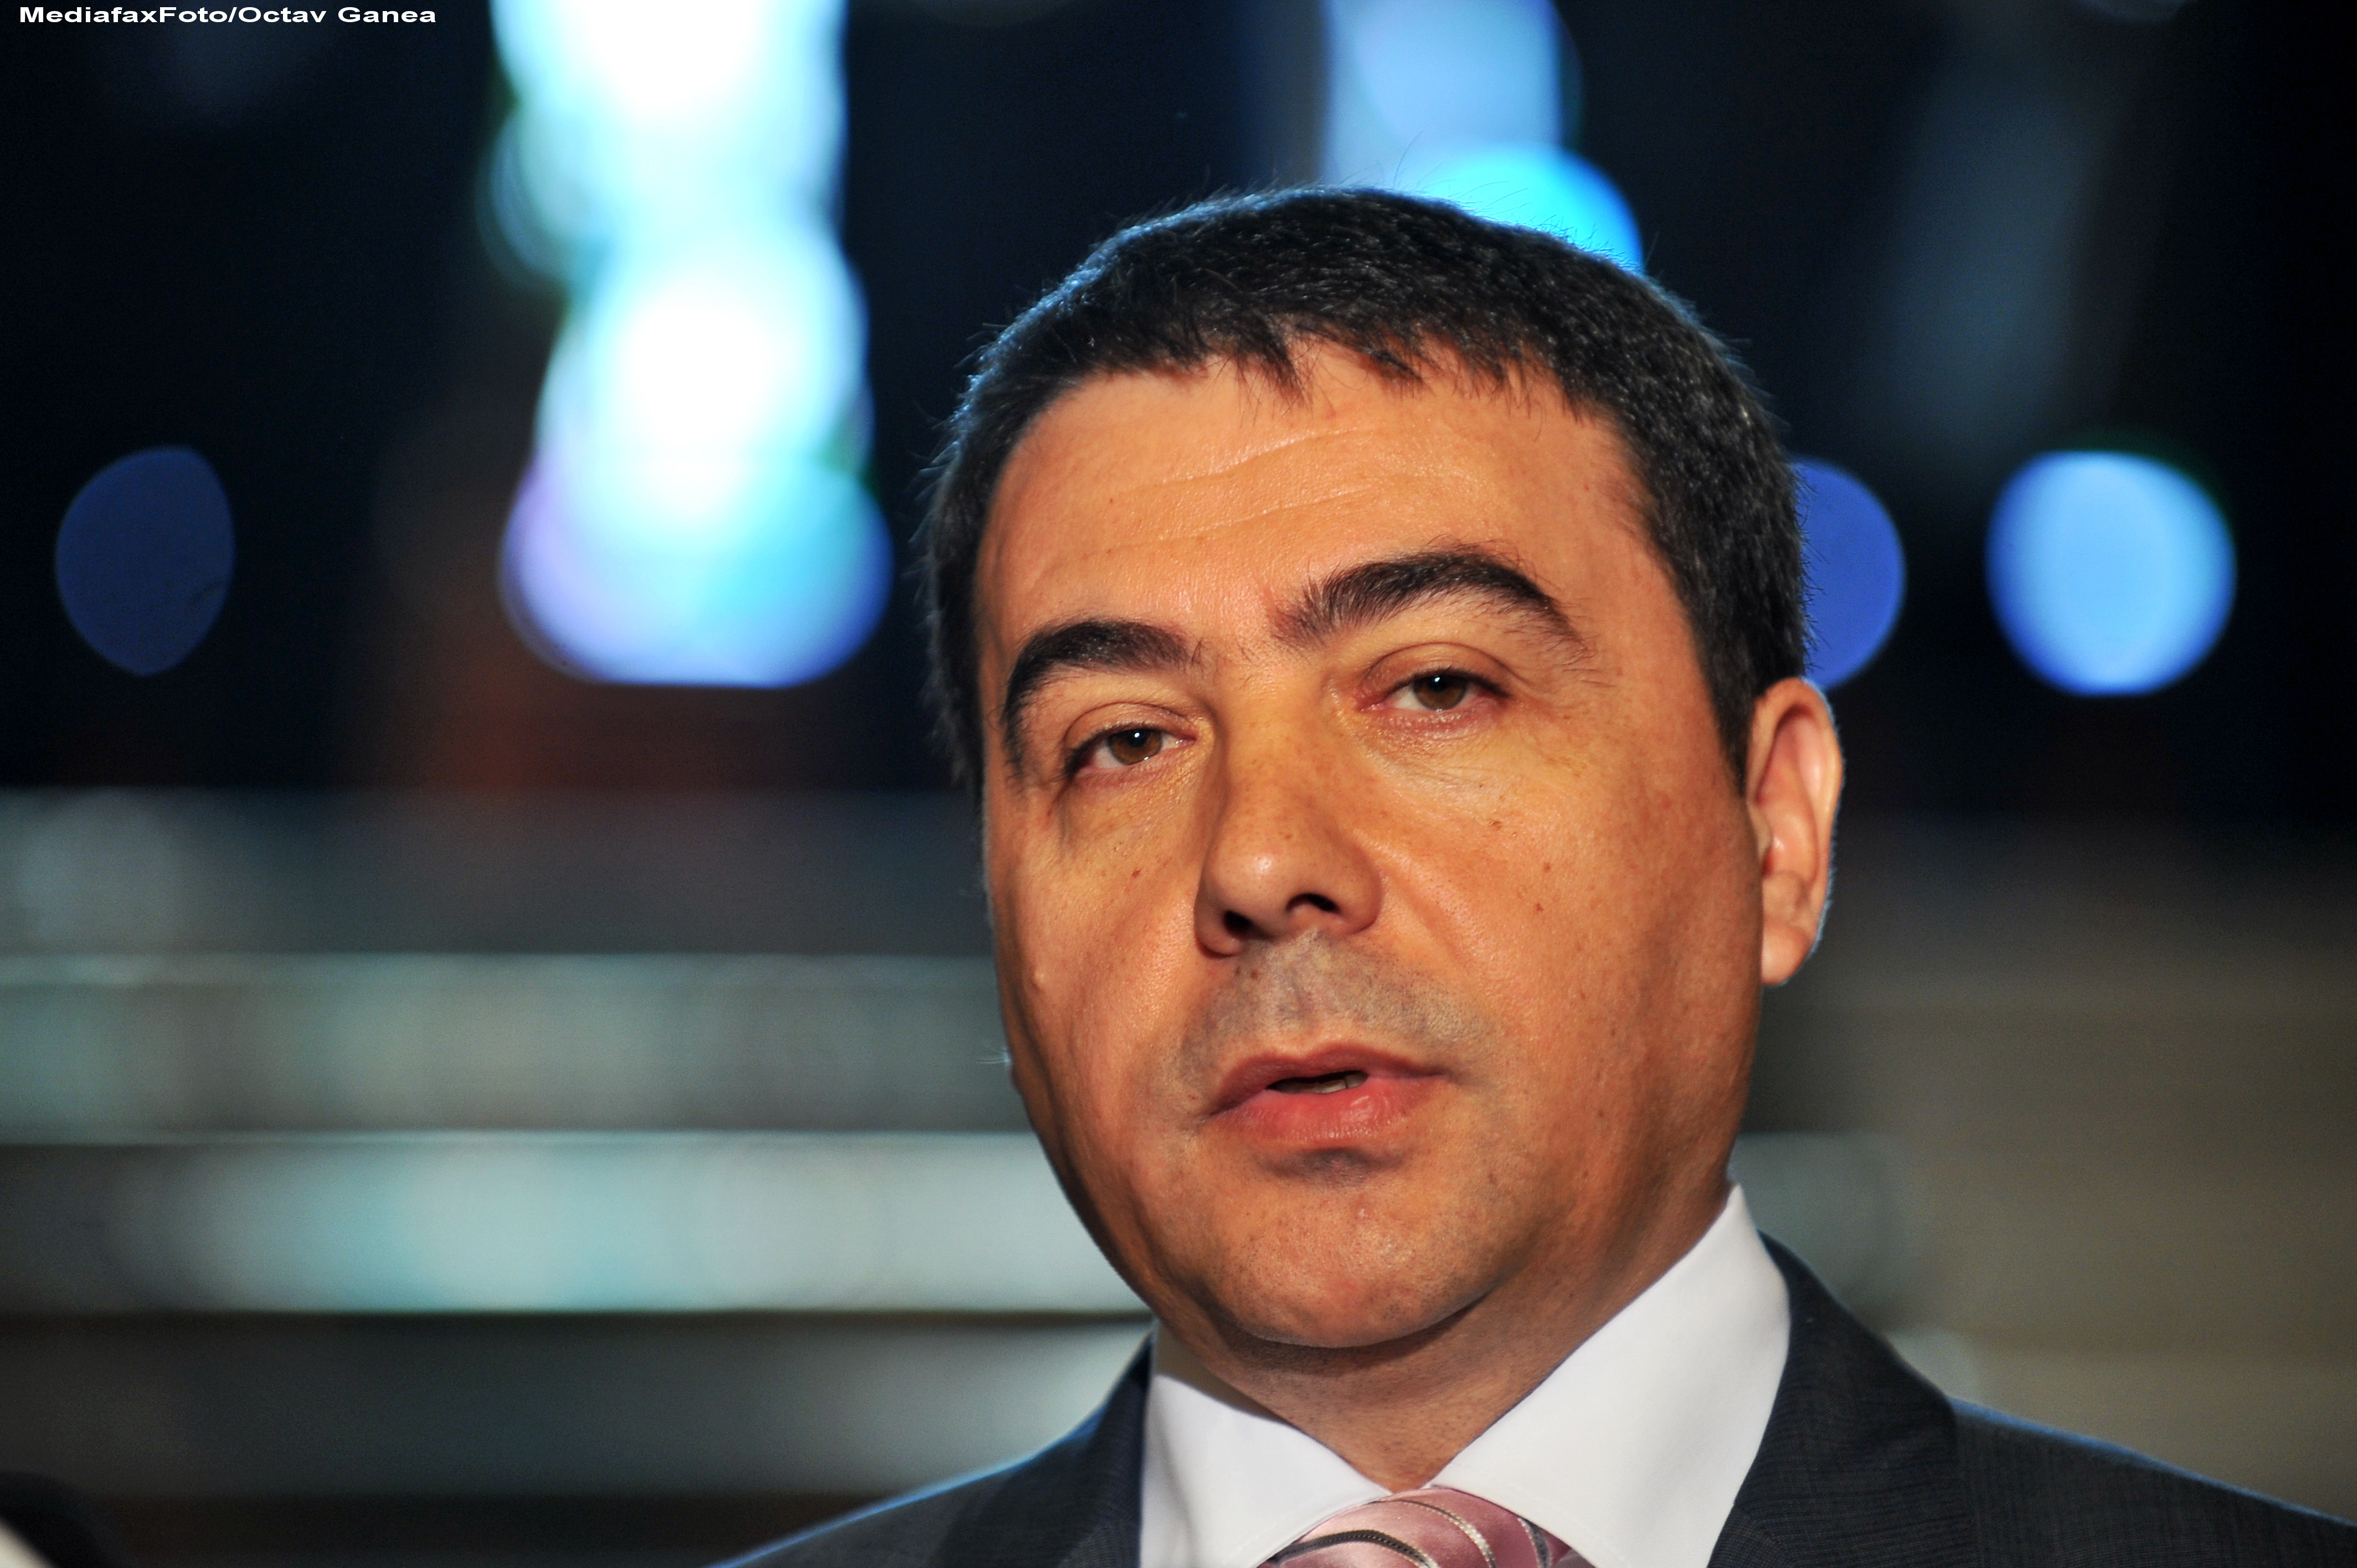 Fostul ministru al Agriculturii Stelian Fuia a fost trimis in judecata pentru abuz in serviciu, in dosarul